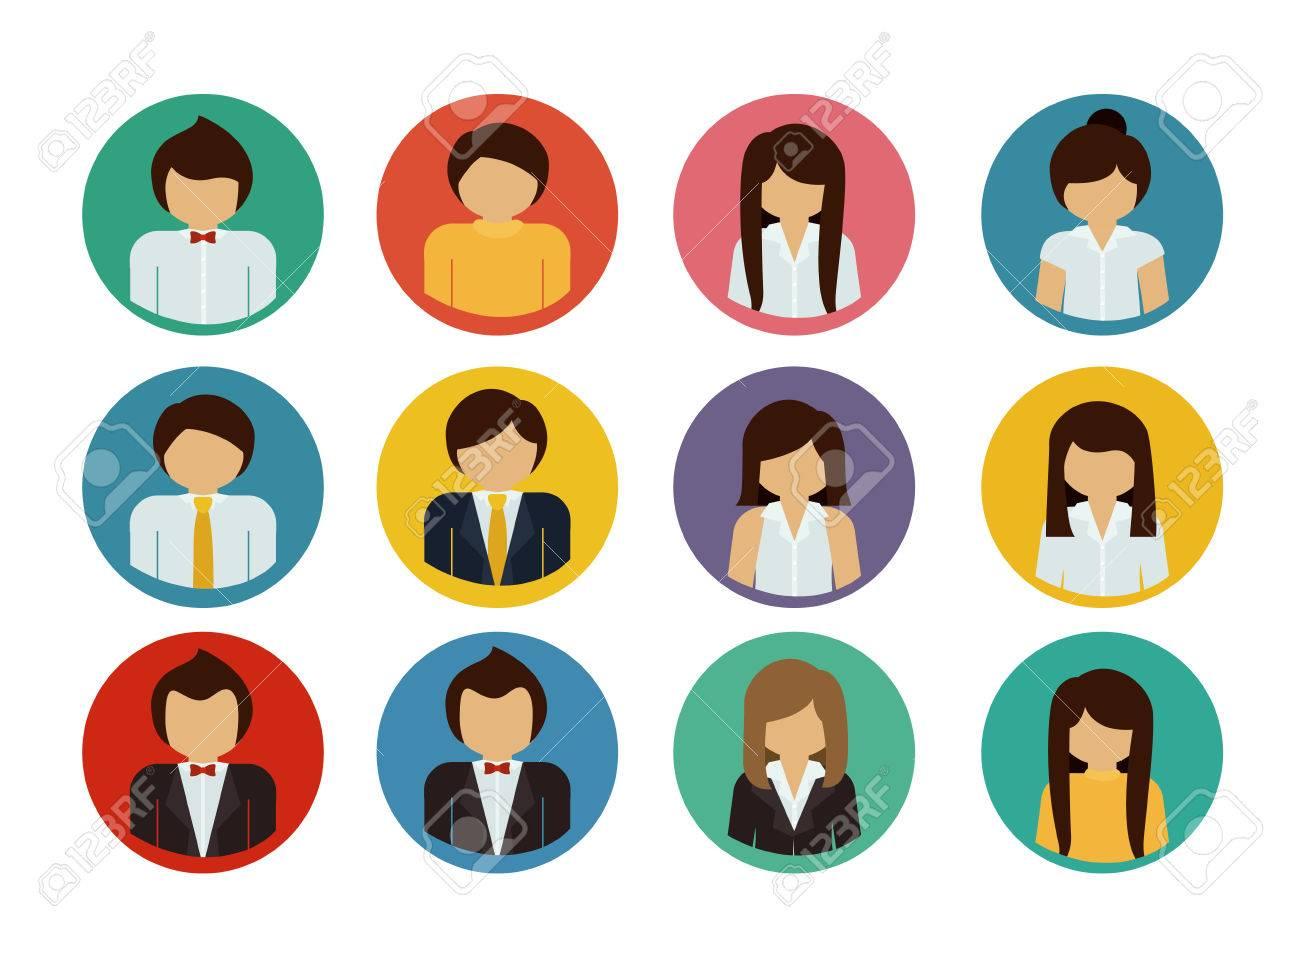 Human Resources design over white background, vector illustration - 40204055